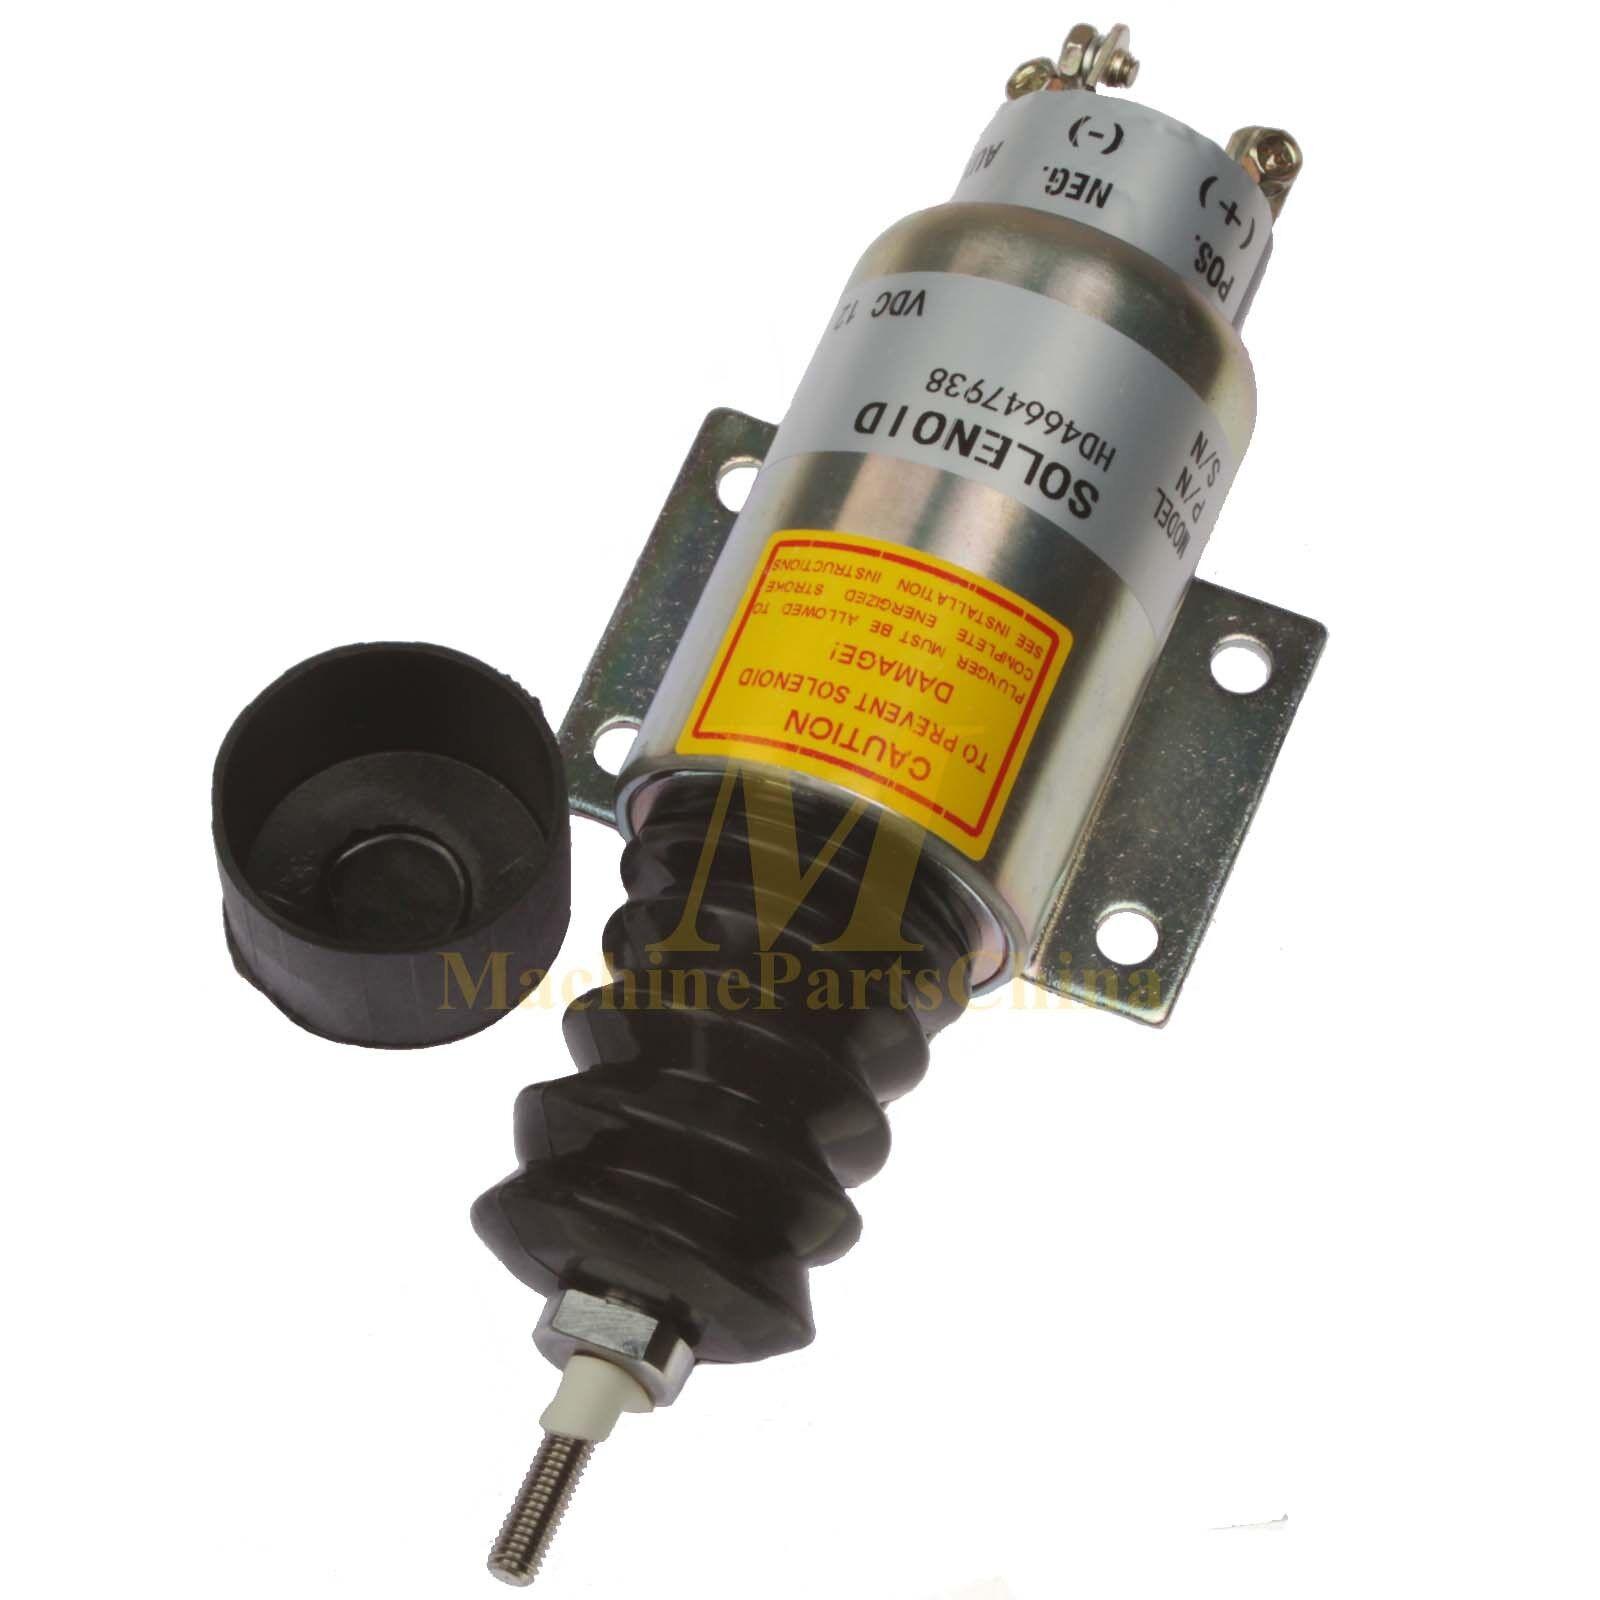 12V Diesel Shut Down Solenoid SA-4994-12 1757ES-12E8ULB1S5 1757ES-12E8ULB155